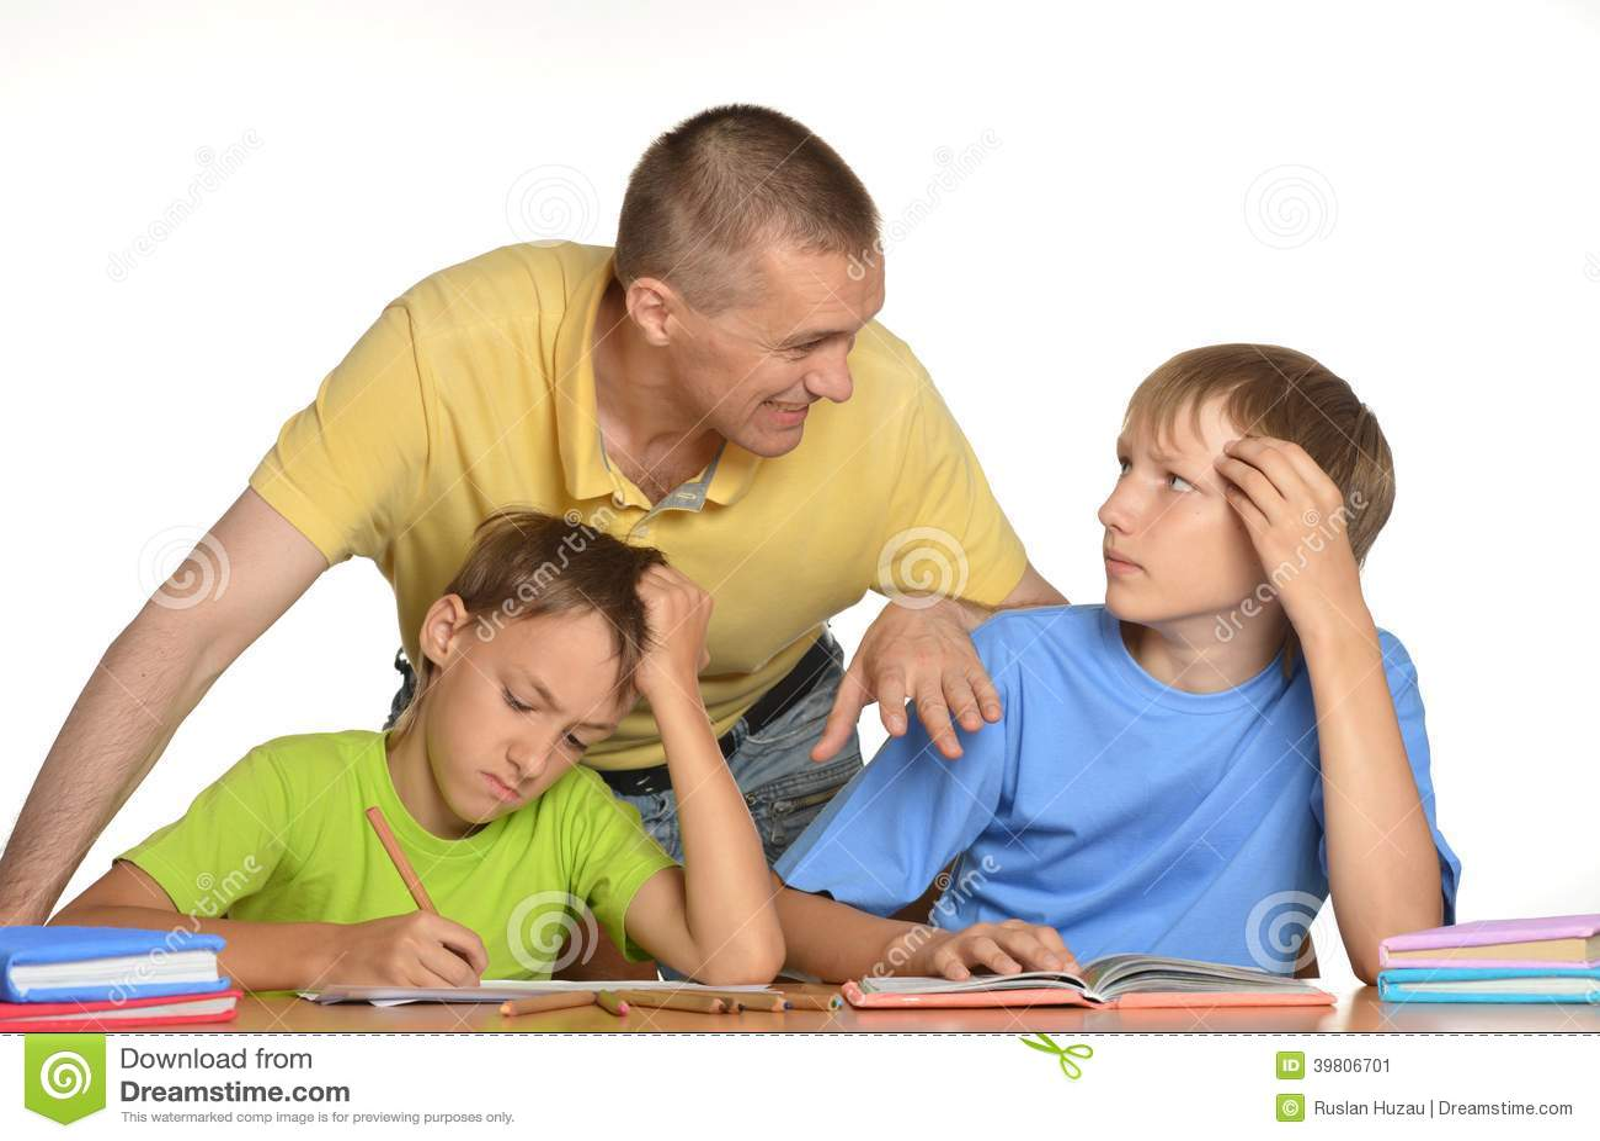 Statistics kids doing their homework